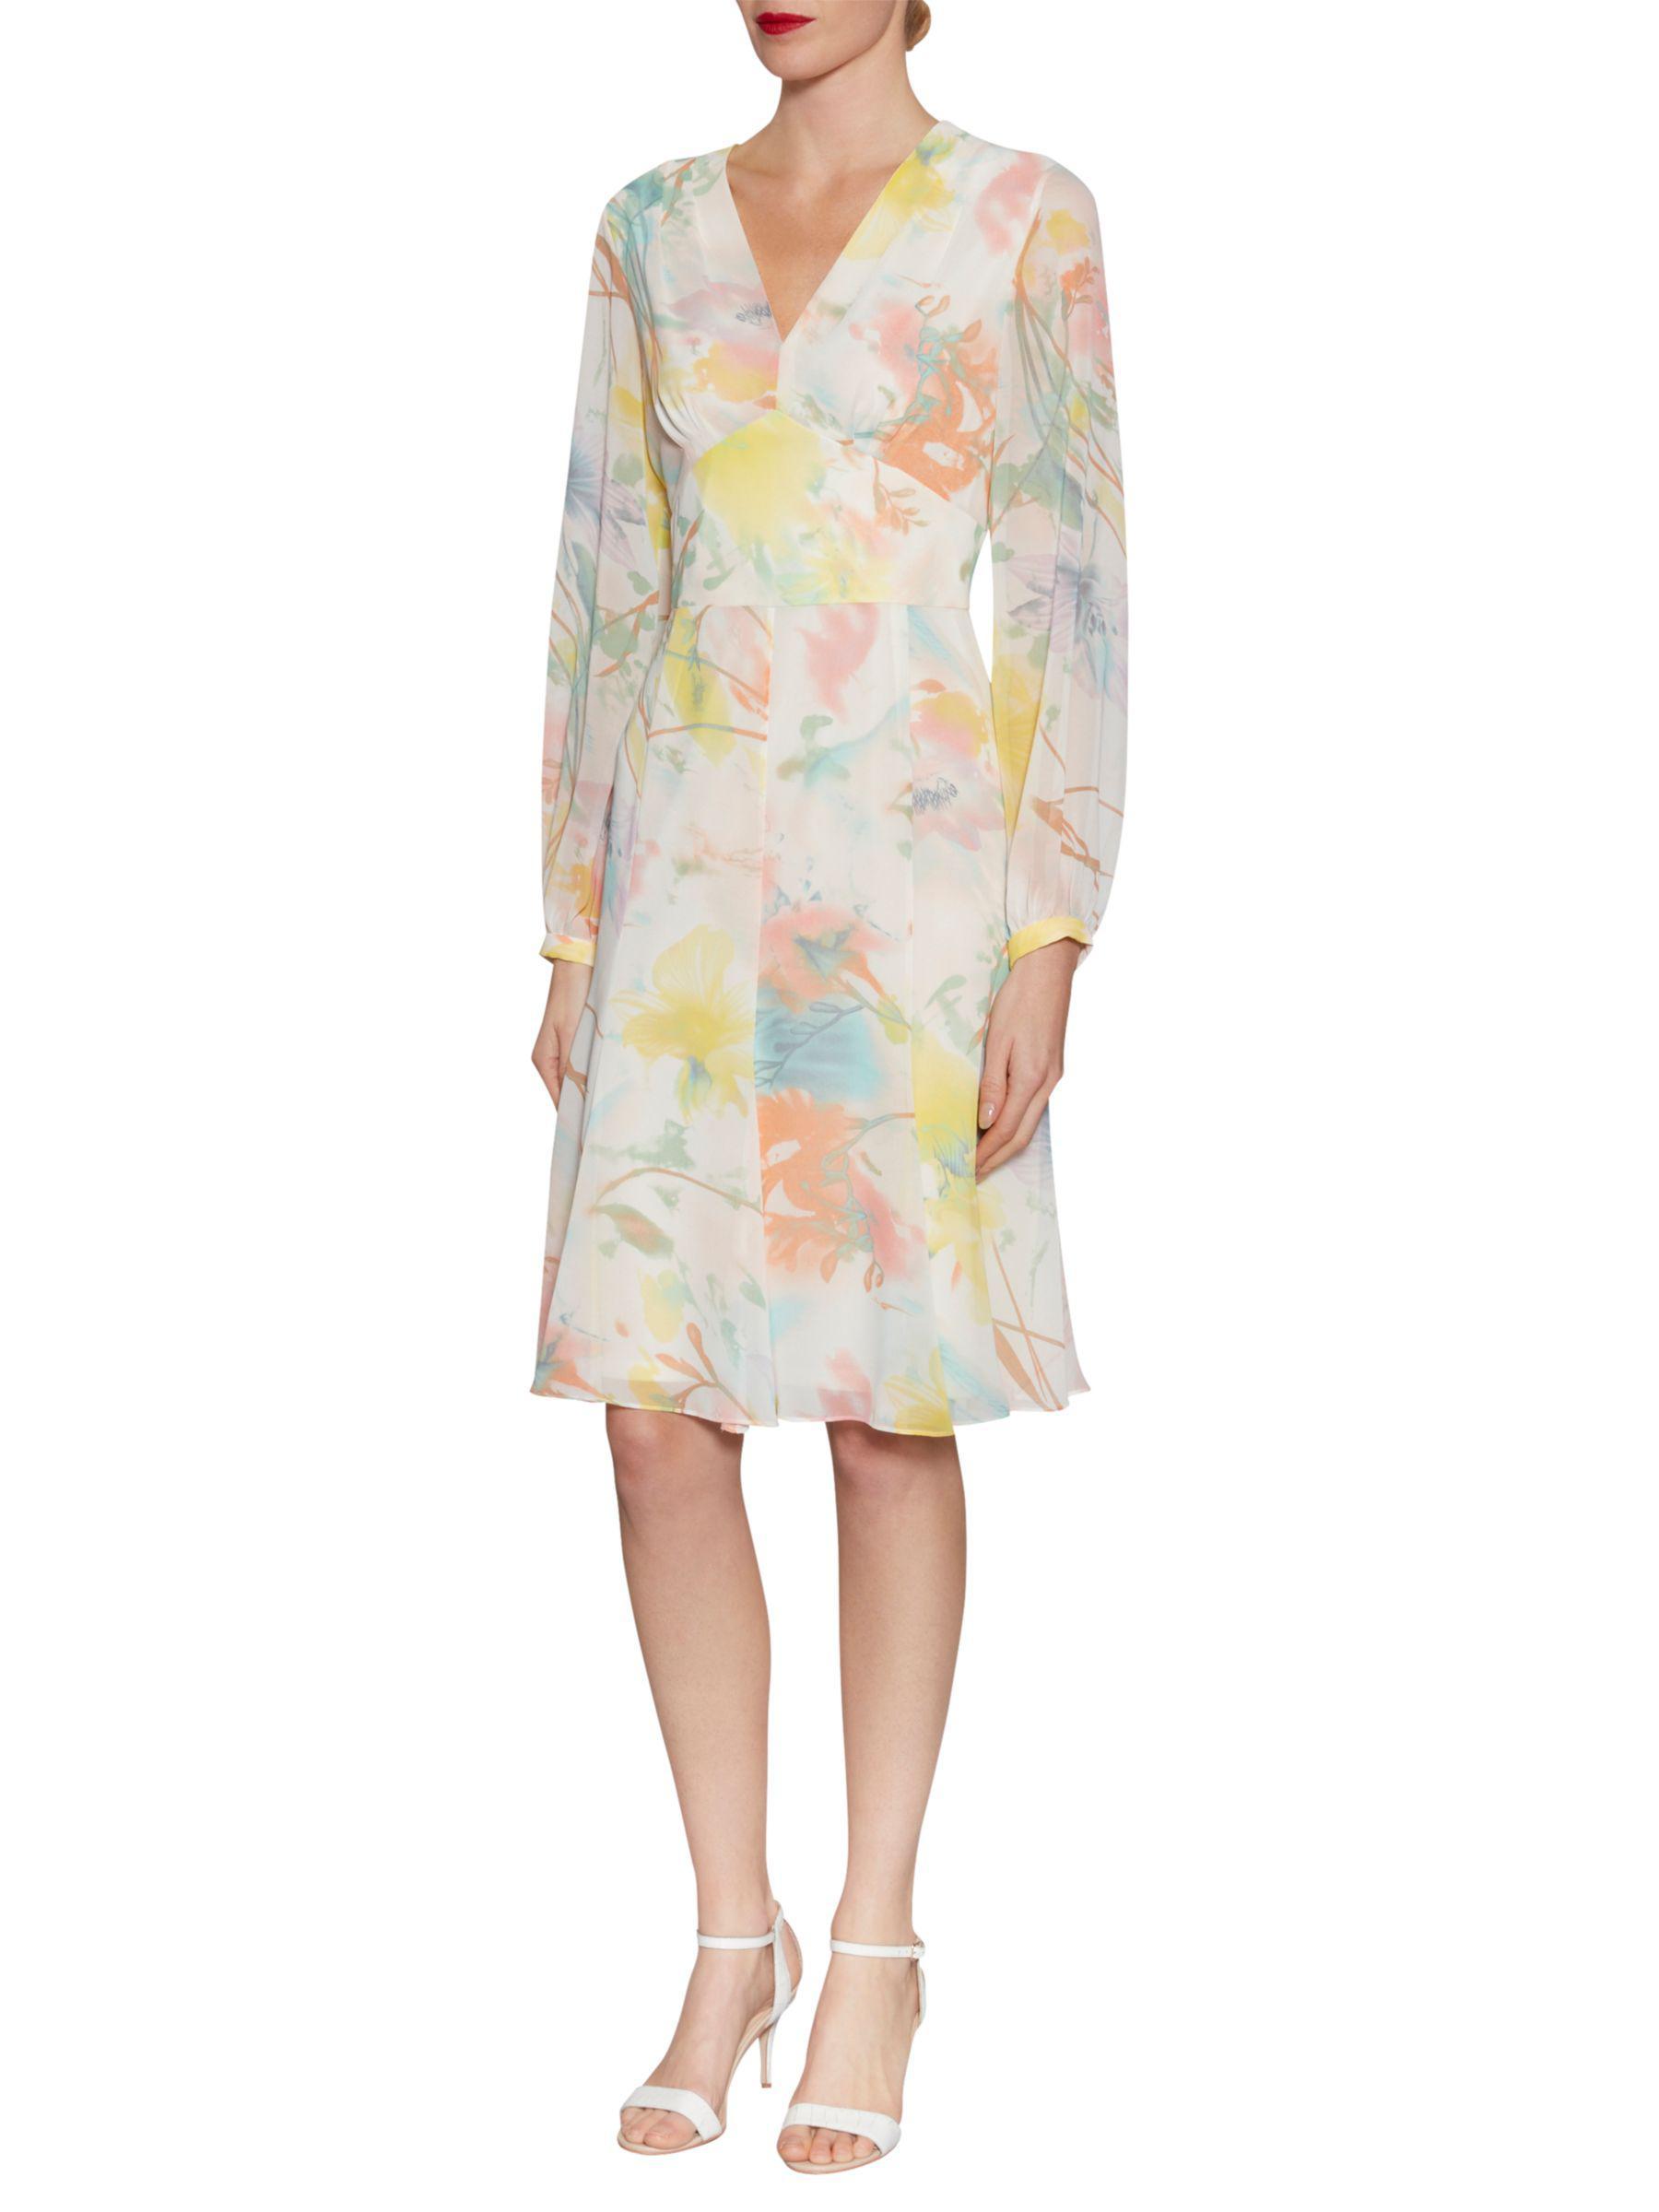 John Lewis Gina Bacconi Watercolour Floral Print Chiffon Dress in Yellow